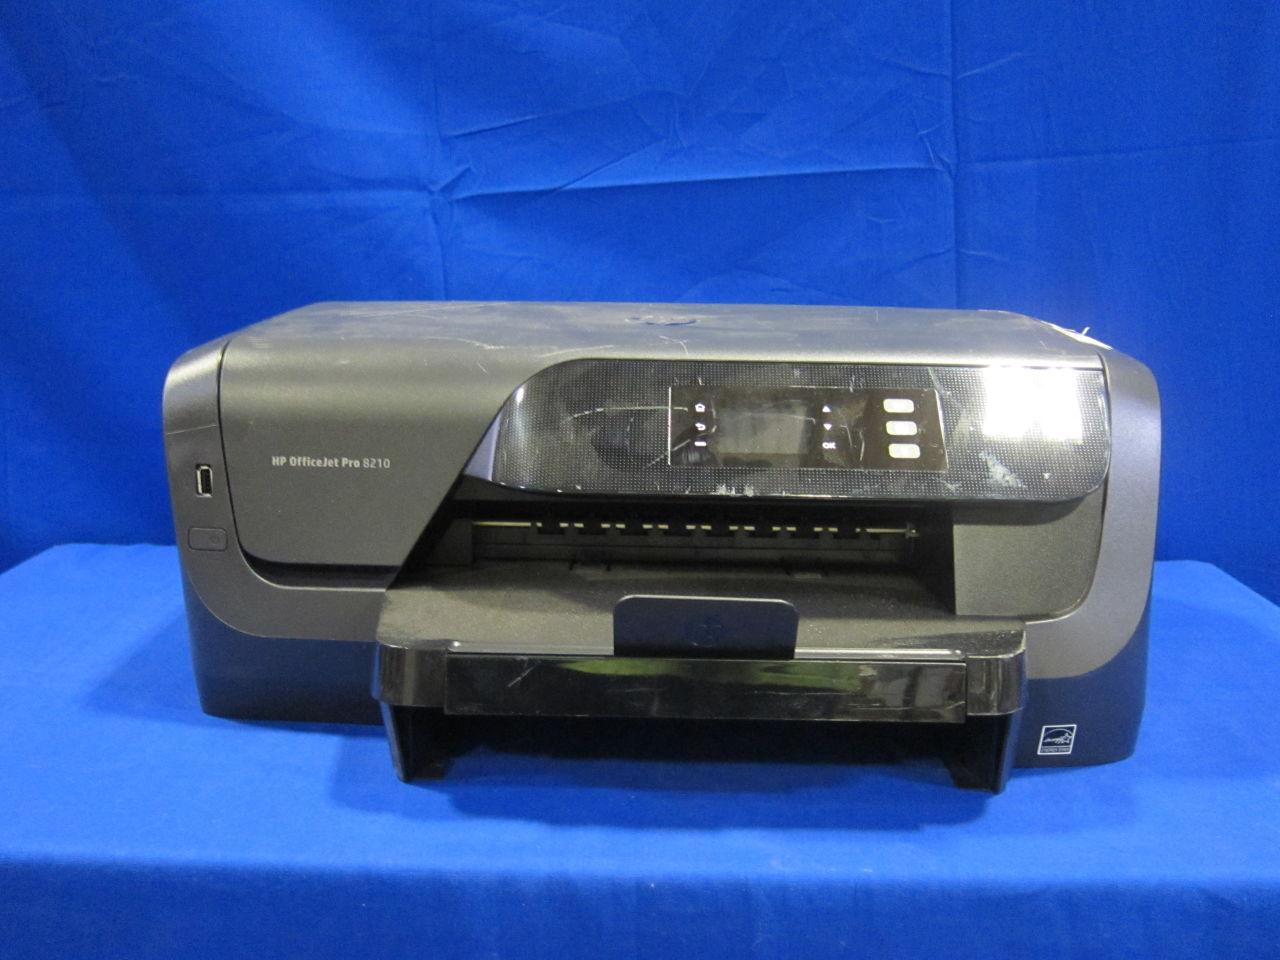 HEWLET PACKARD OfficeJet Pro 8210 Printer